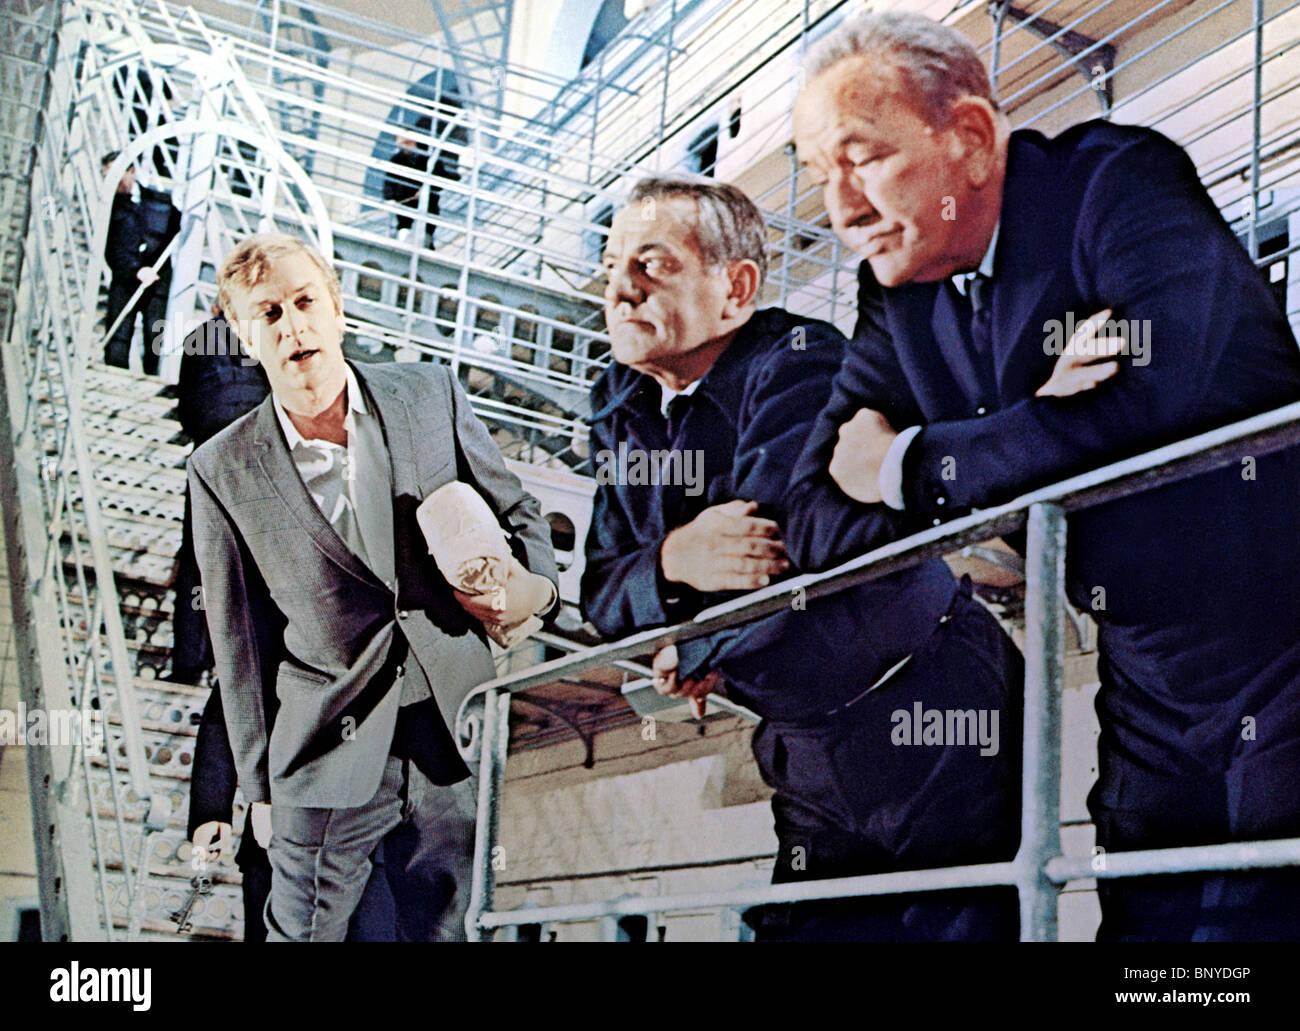 The italian job (soundtrack) wikipedia.